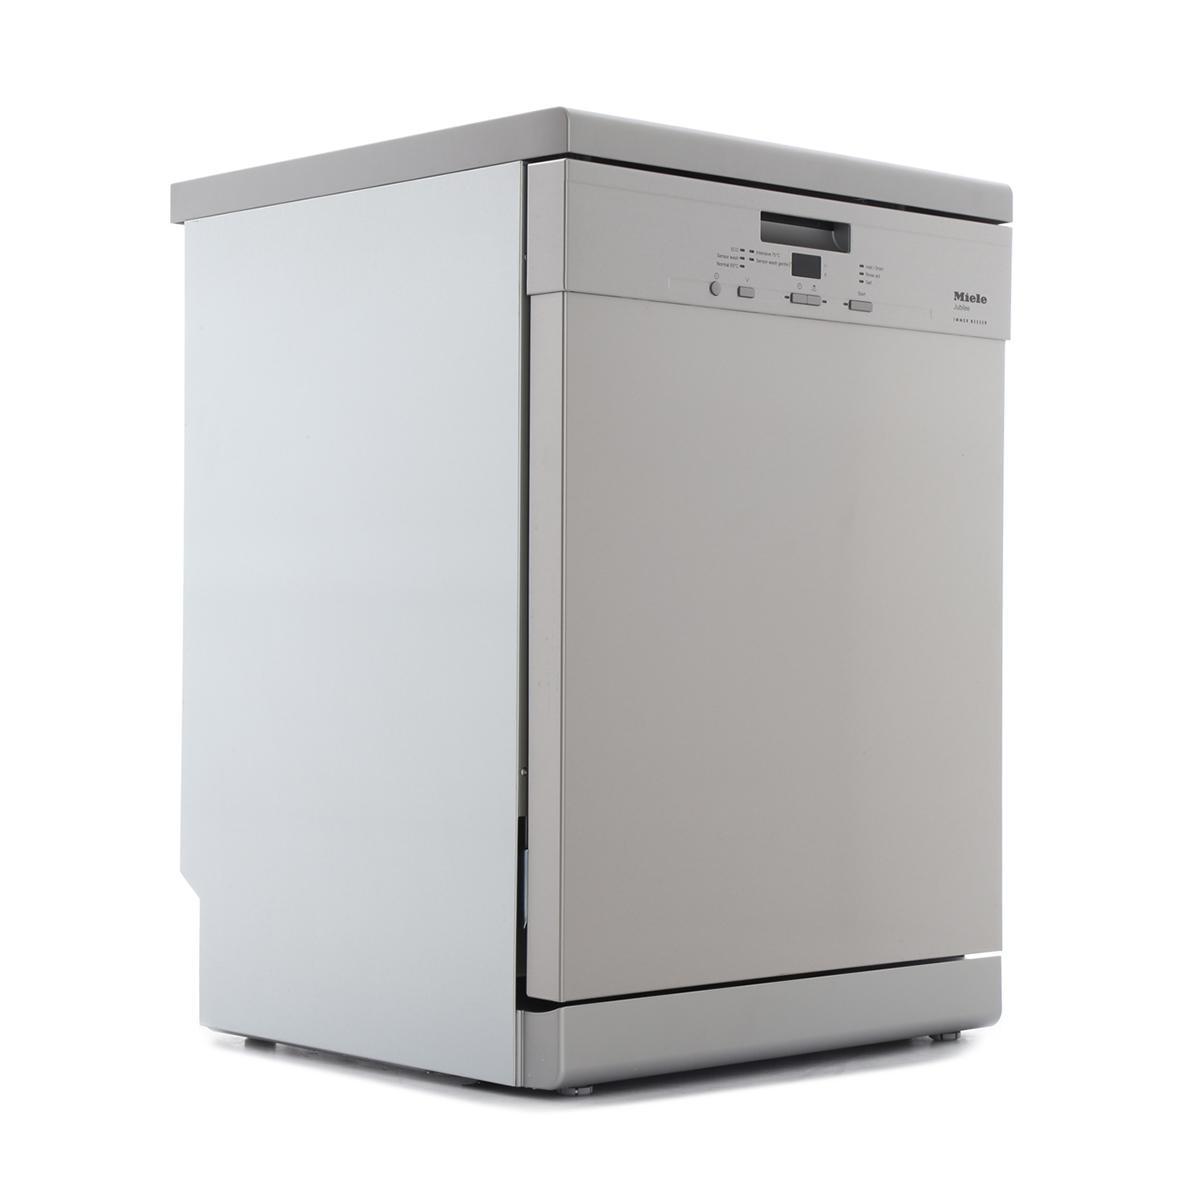 Miele G4940BK CleanSteel Dishwasher